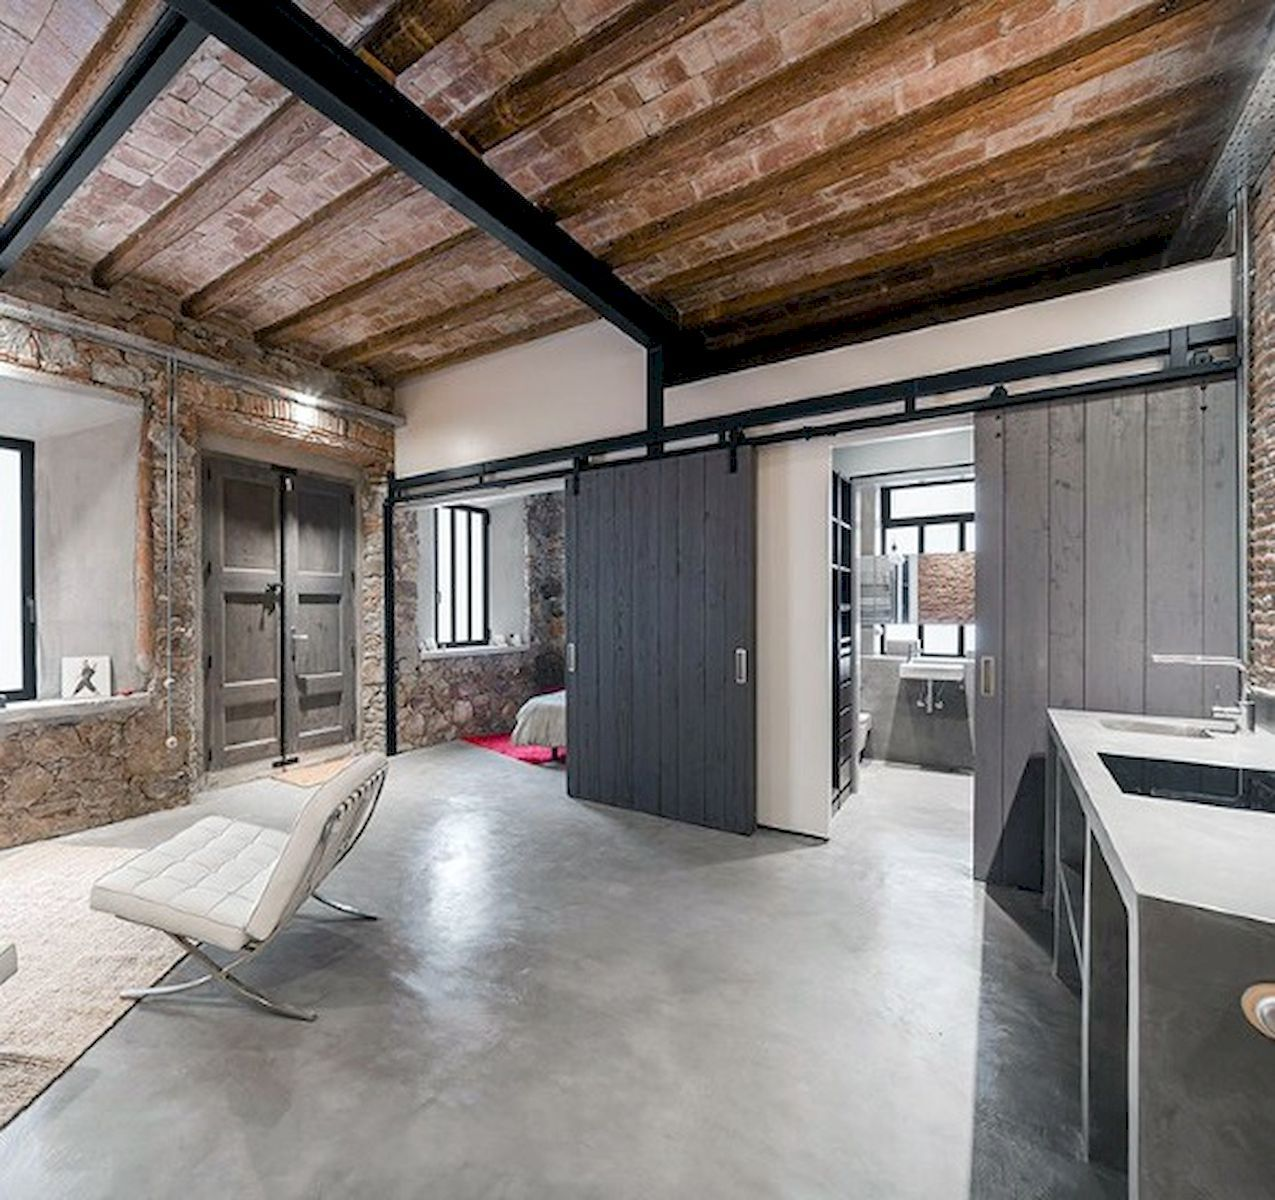 Industrial Style House Design Concept - watonmuni.com ...